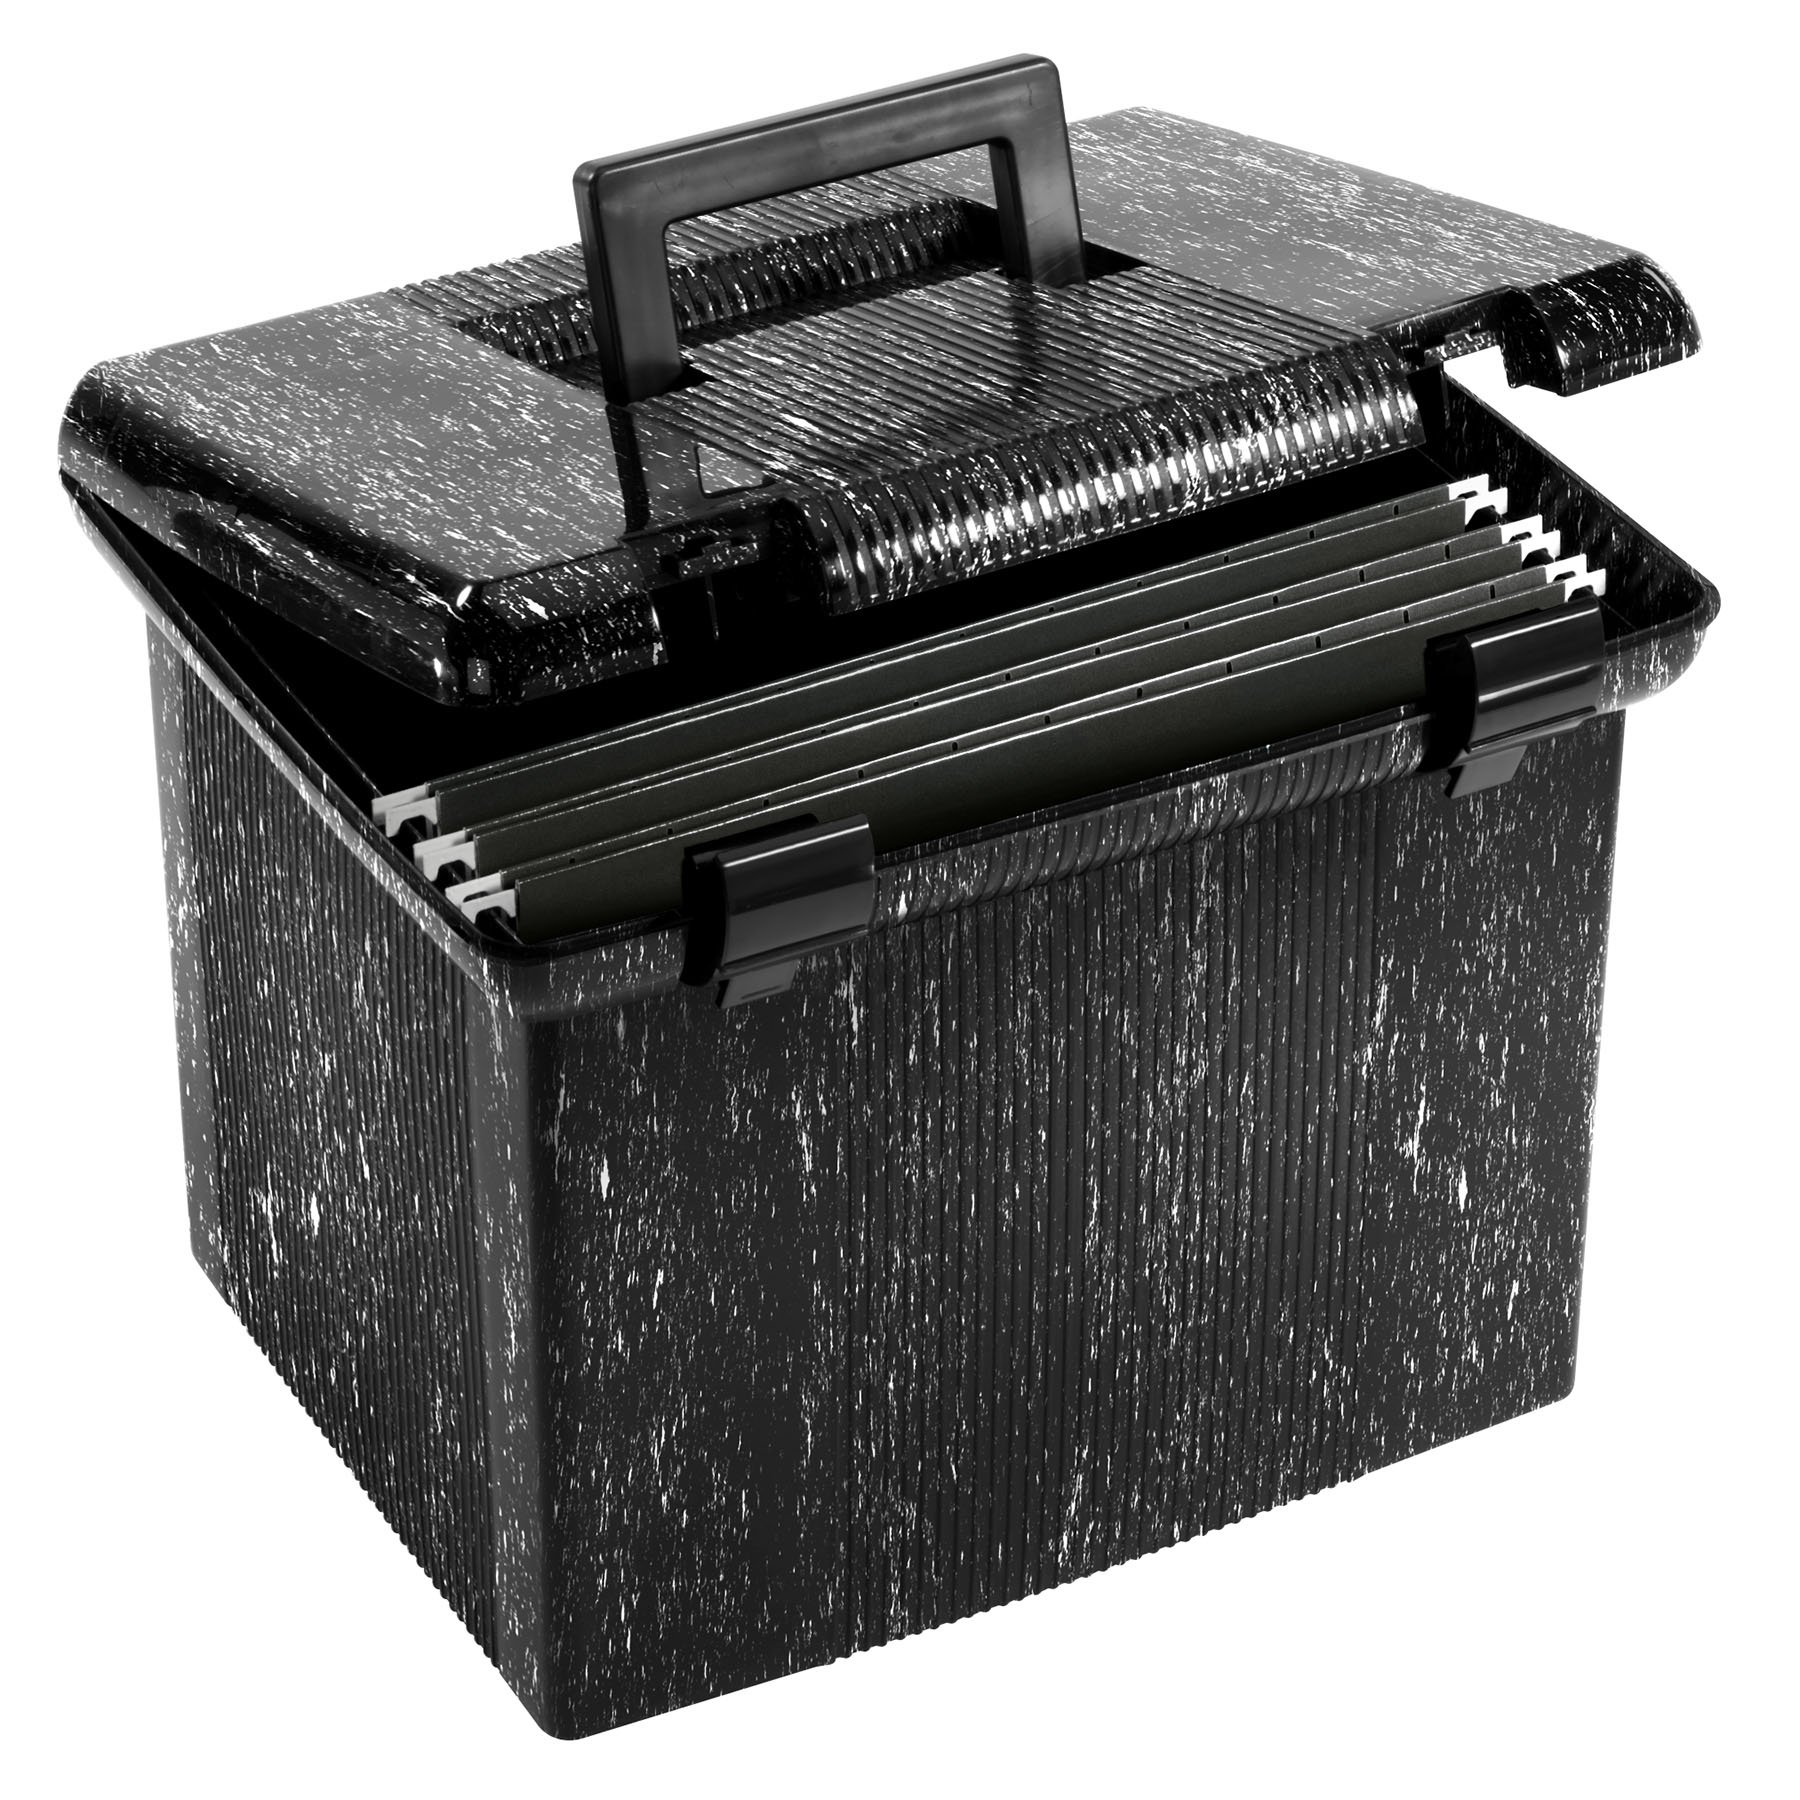 Pendaflex Portable File Box, 11''H x 14'' W x 11 1/8'' D, Black Marble (41743EE) by Pendaflex